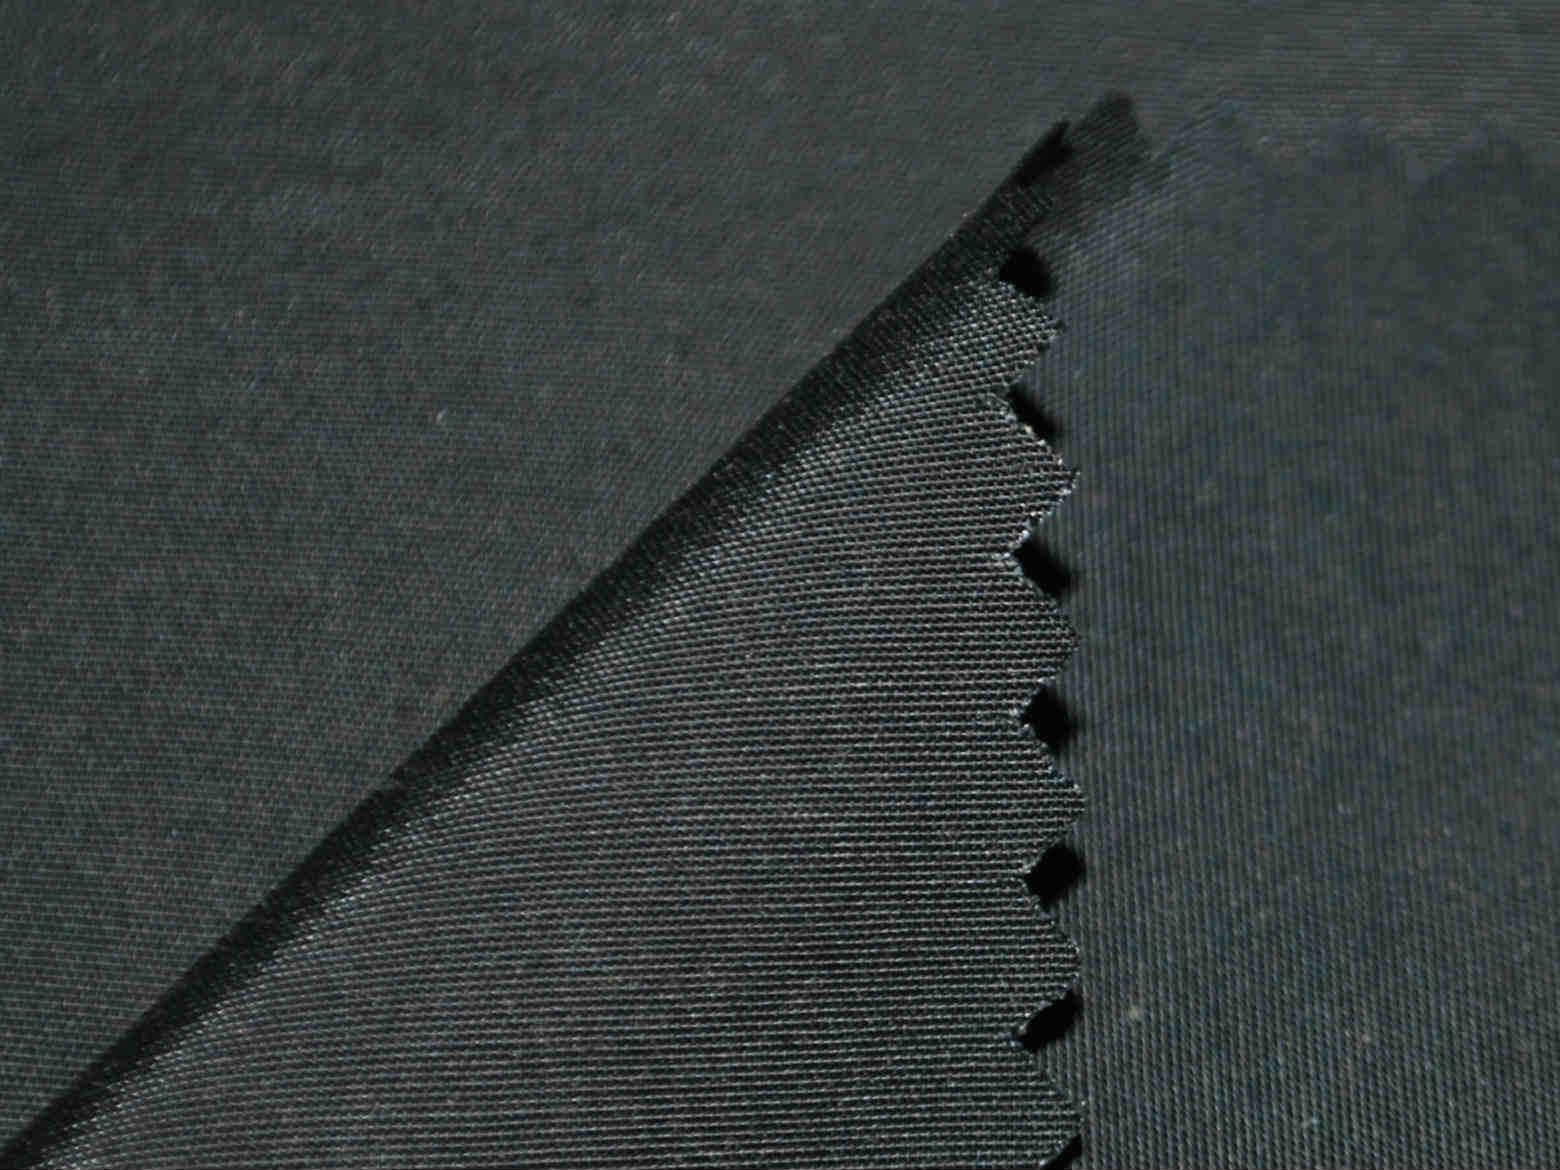 70D*32s Nylon/Cotton Mixed Plain